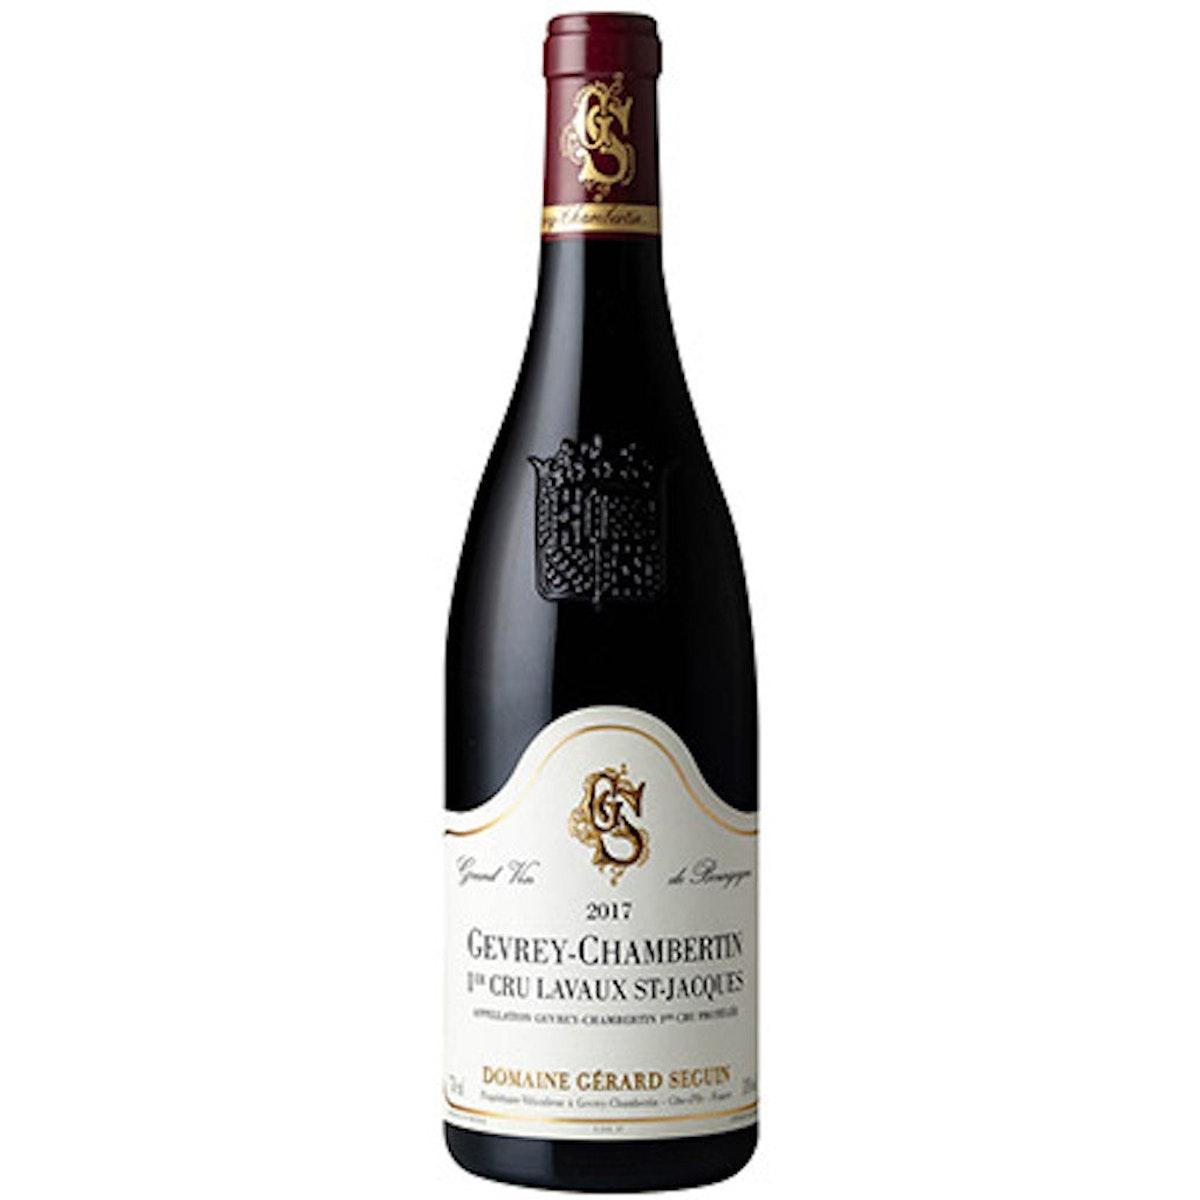 Gevrey-Chambertin 'Lavaux-St-Jacques 1er Cru'